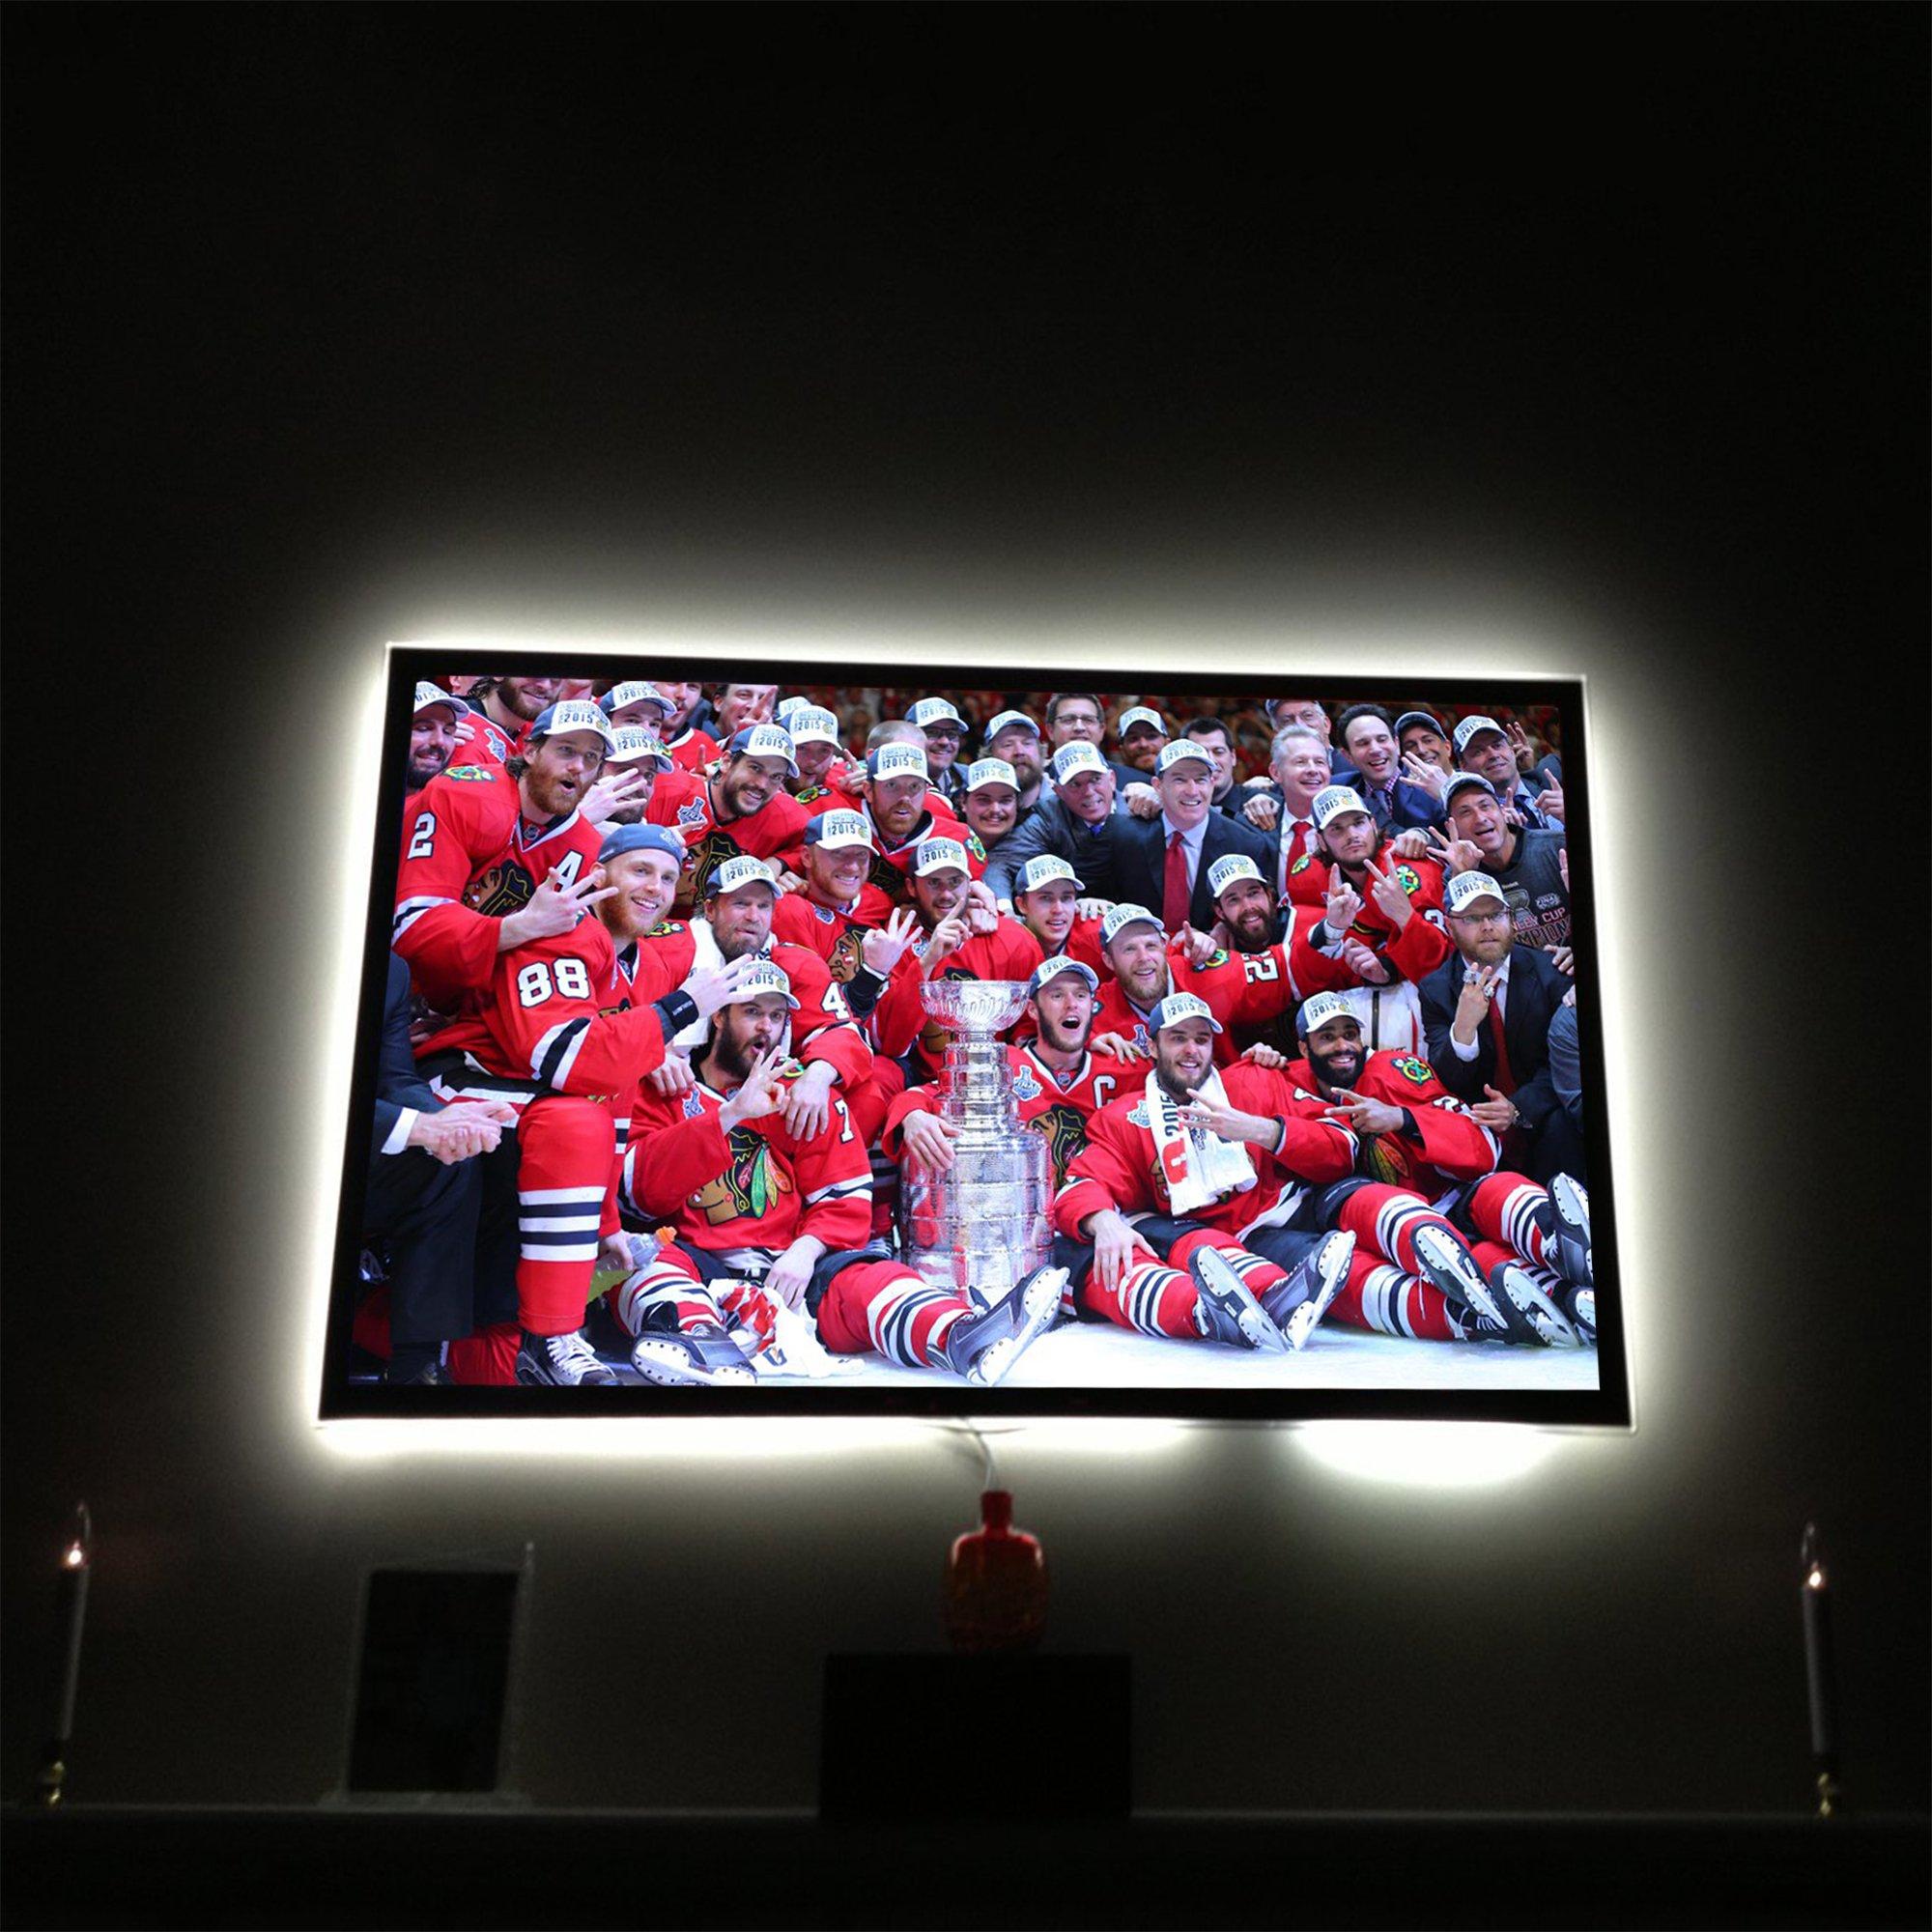 Flat Screen 32 40 43 48 50 55 60 65 70 Inch Tv Background BackLight USB LED Lights Behind TV Backdrop Mood Home Theater Lite Strip